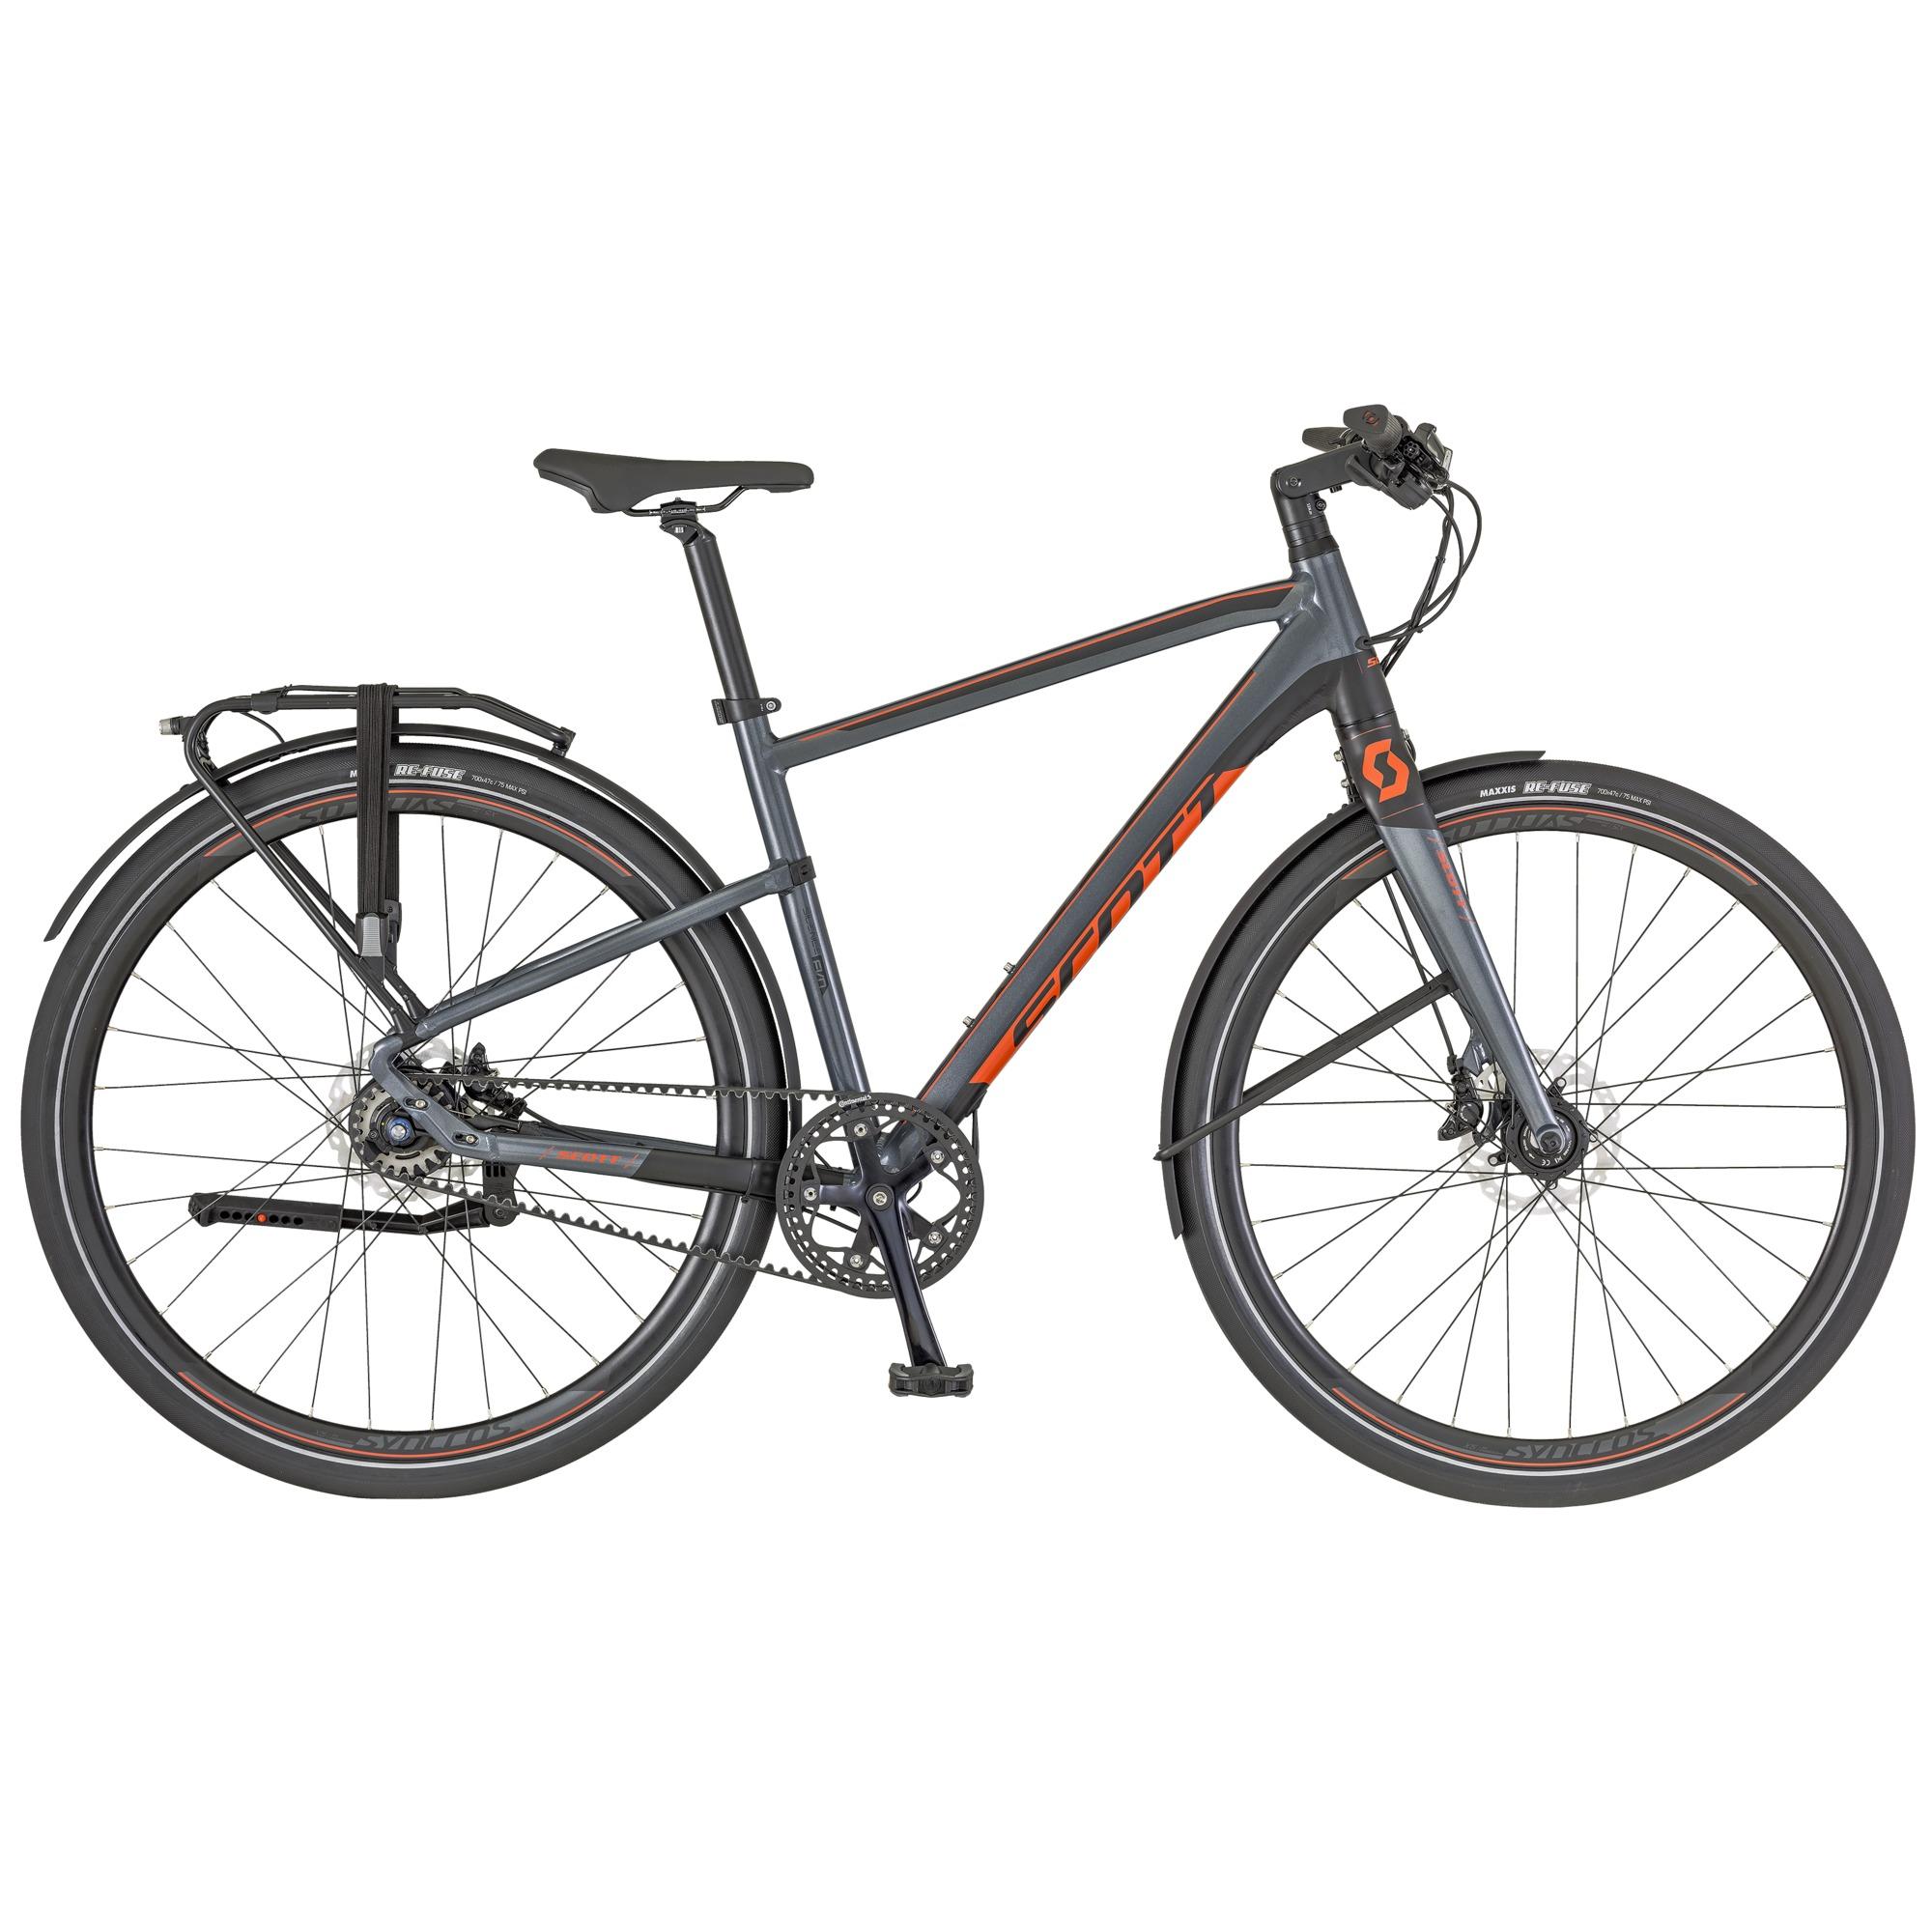 SCOTT Silence Evo Bike L - Zweirad Homann